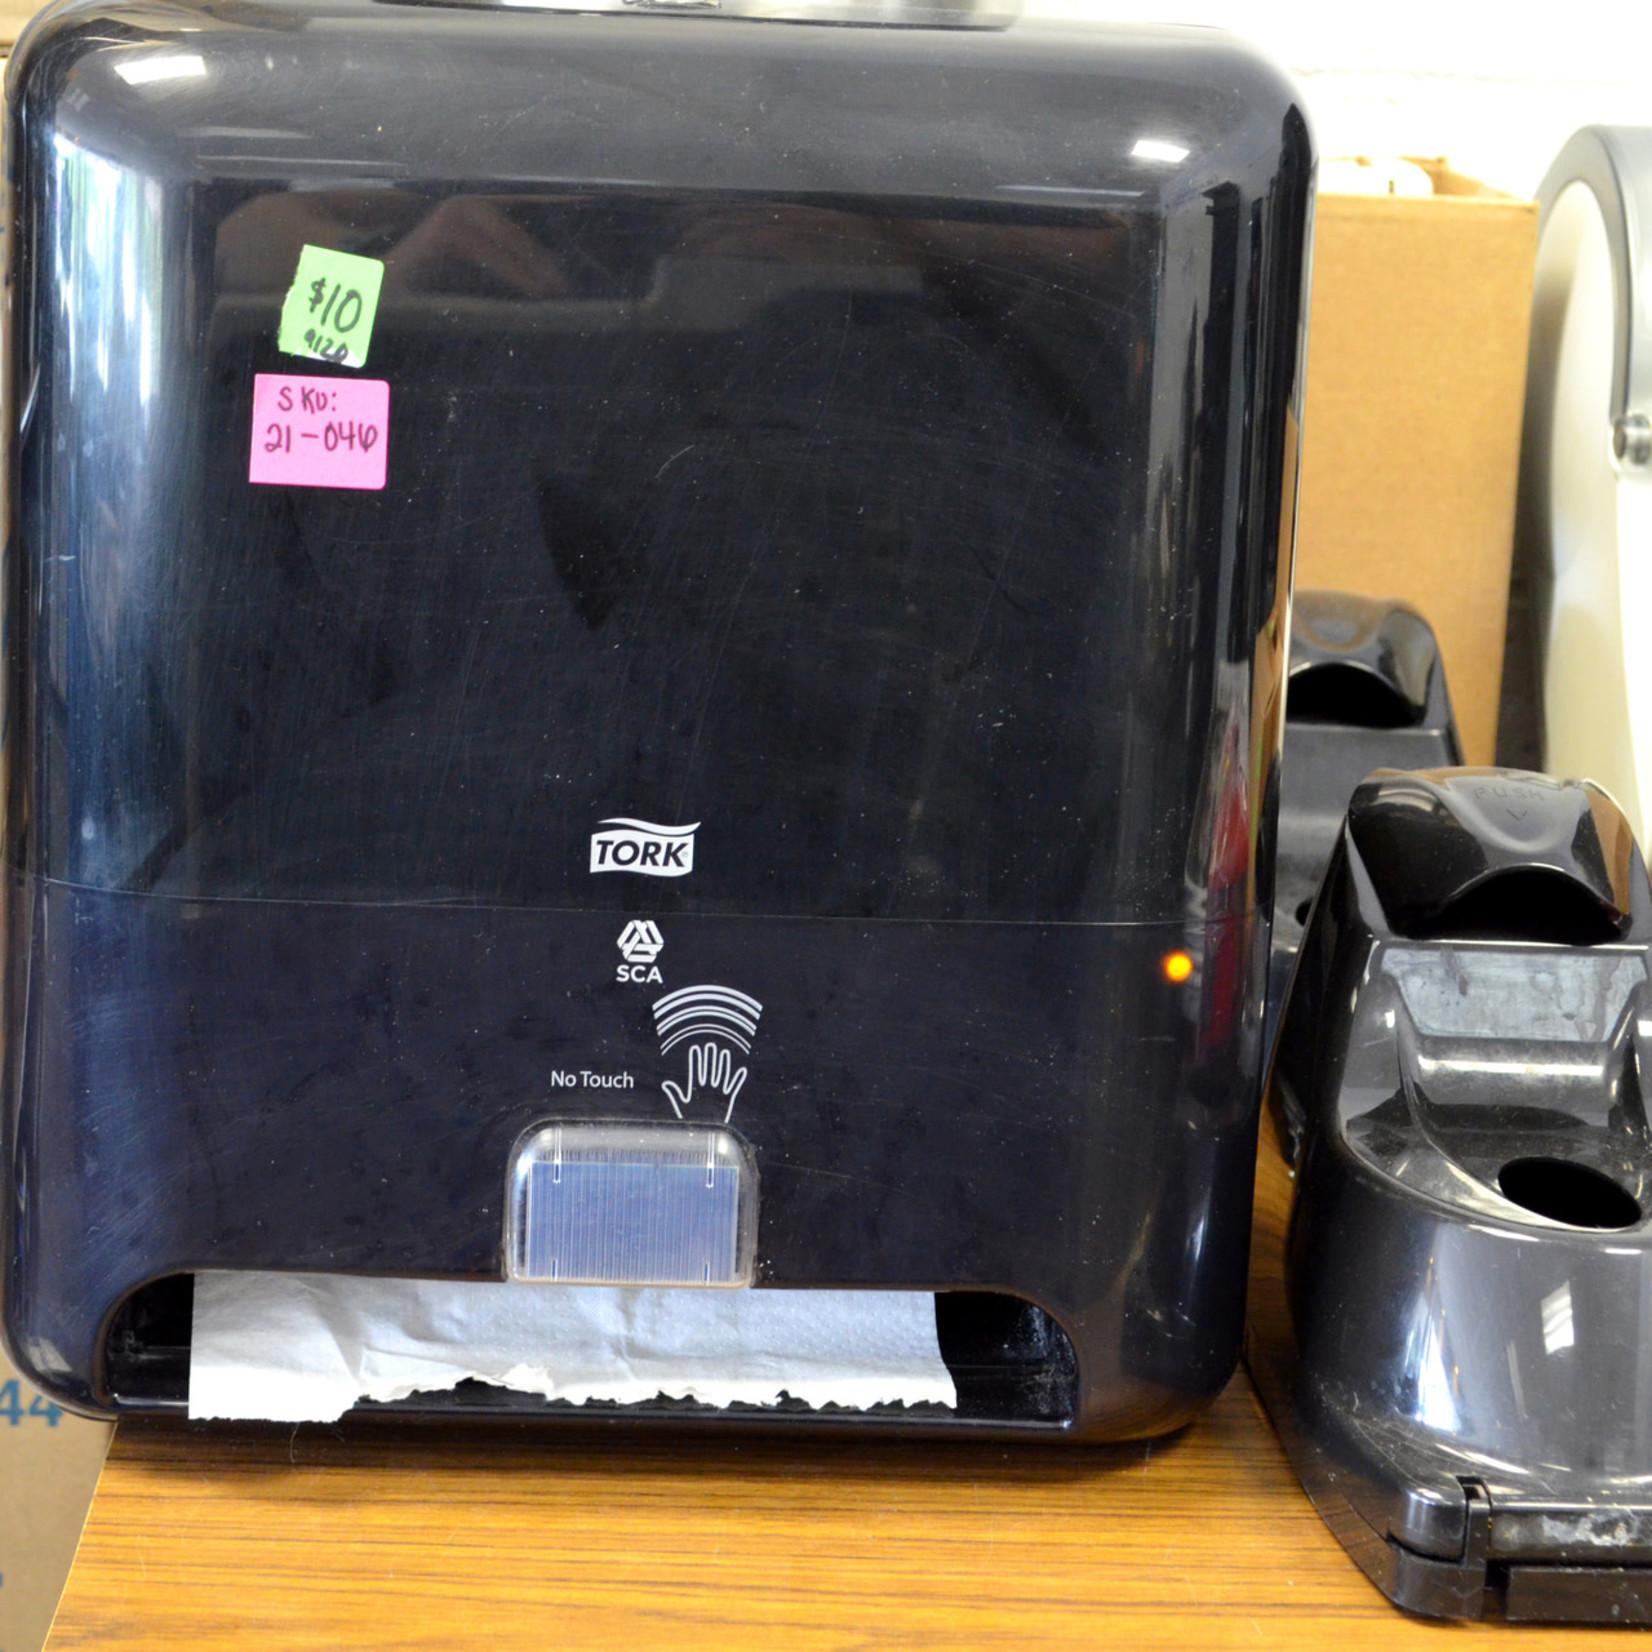 Tork No Touch Paper Towel Dispenser